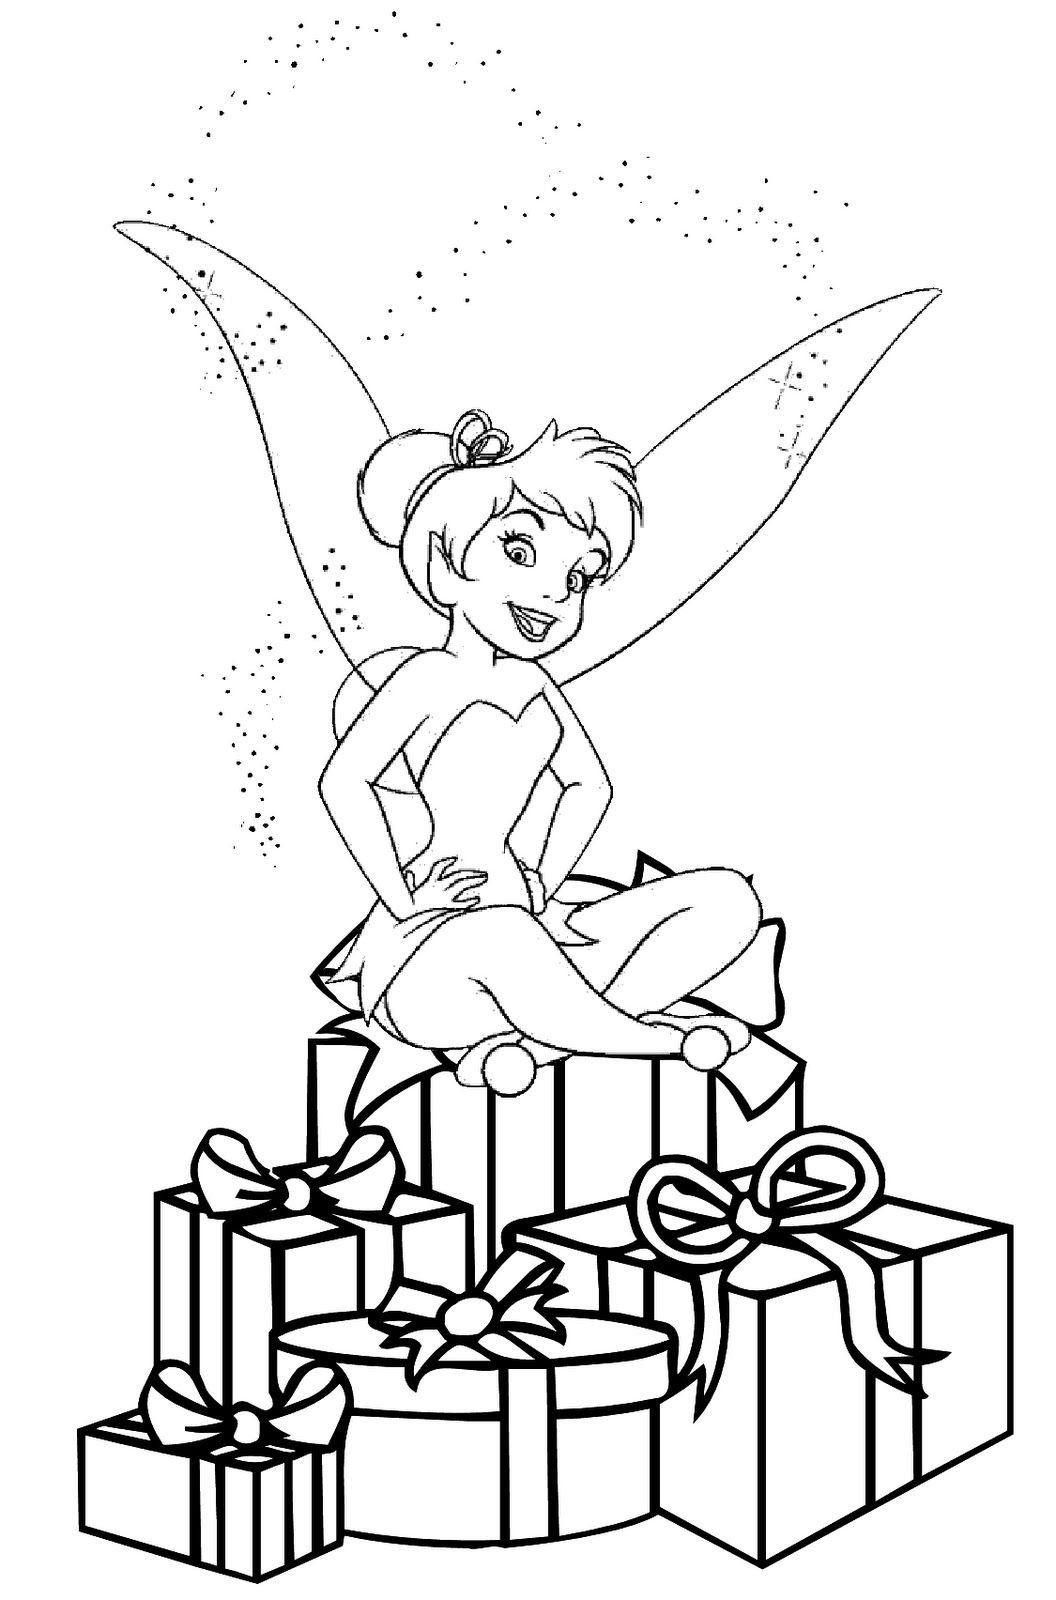 childrens christmas colouring christmas coloring pages christmas fairy coloring colouring christmas childrens